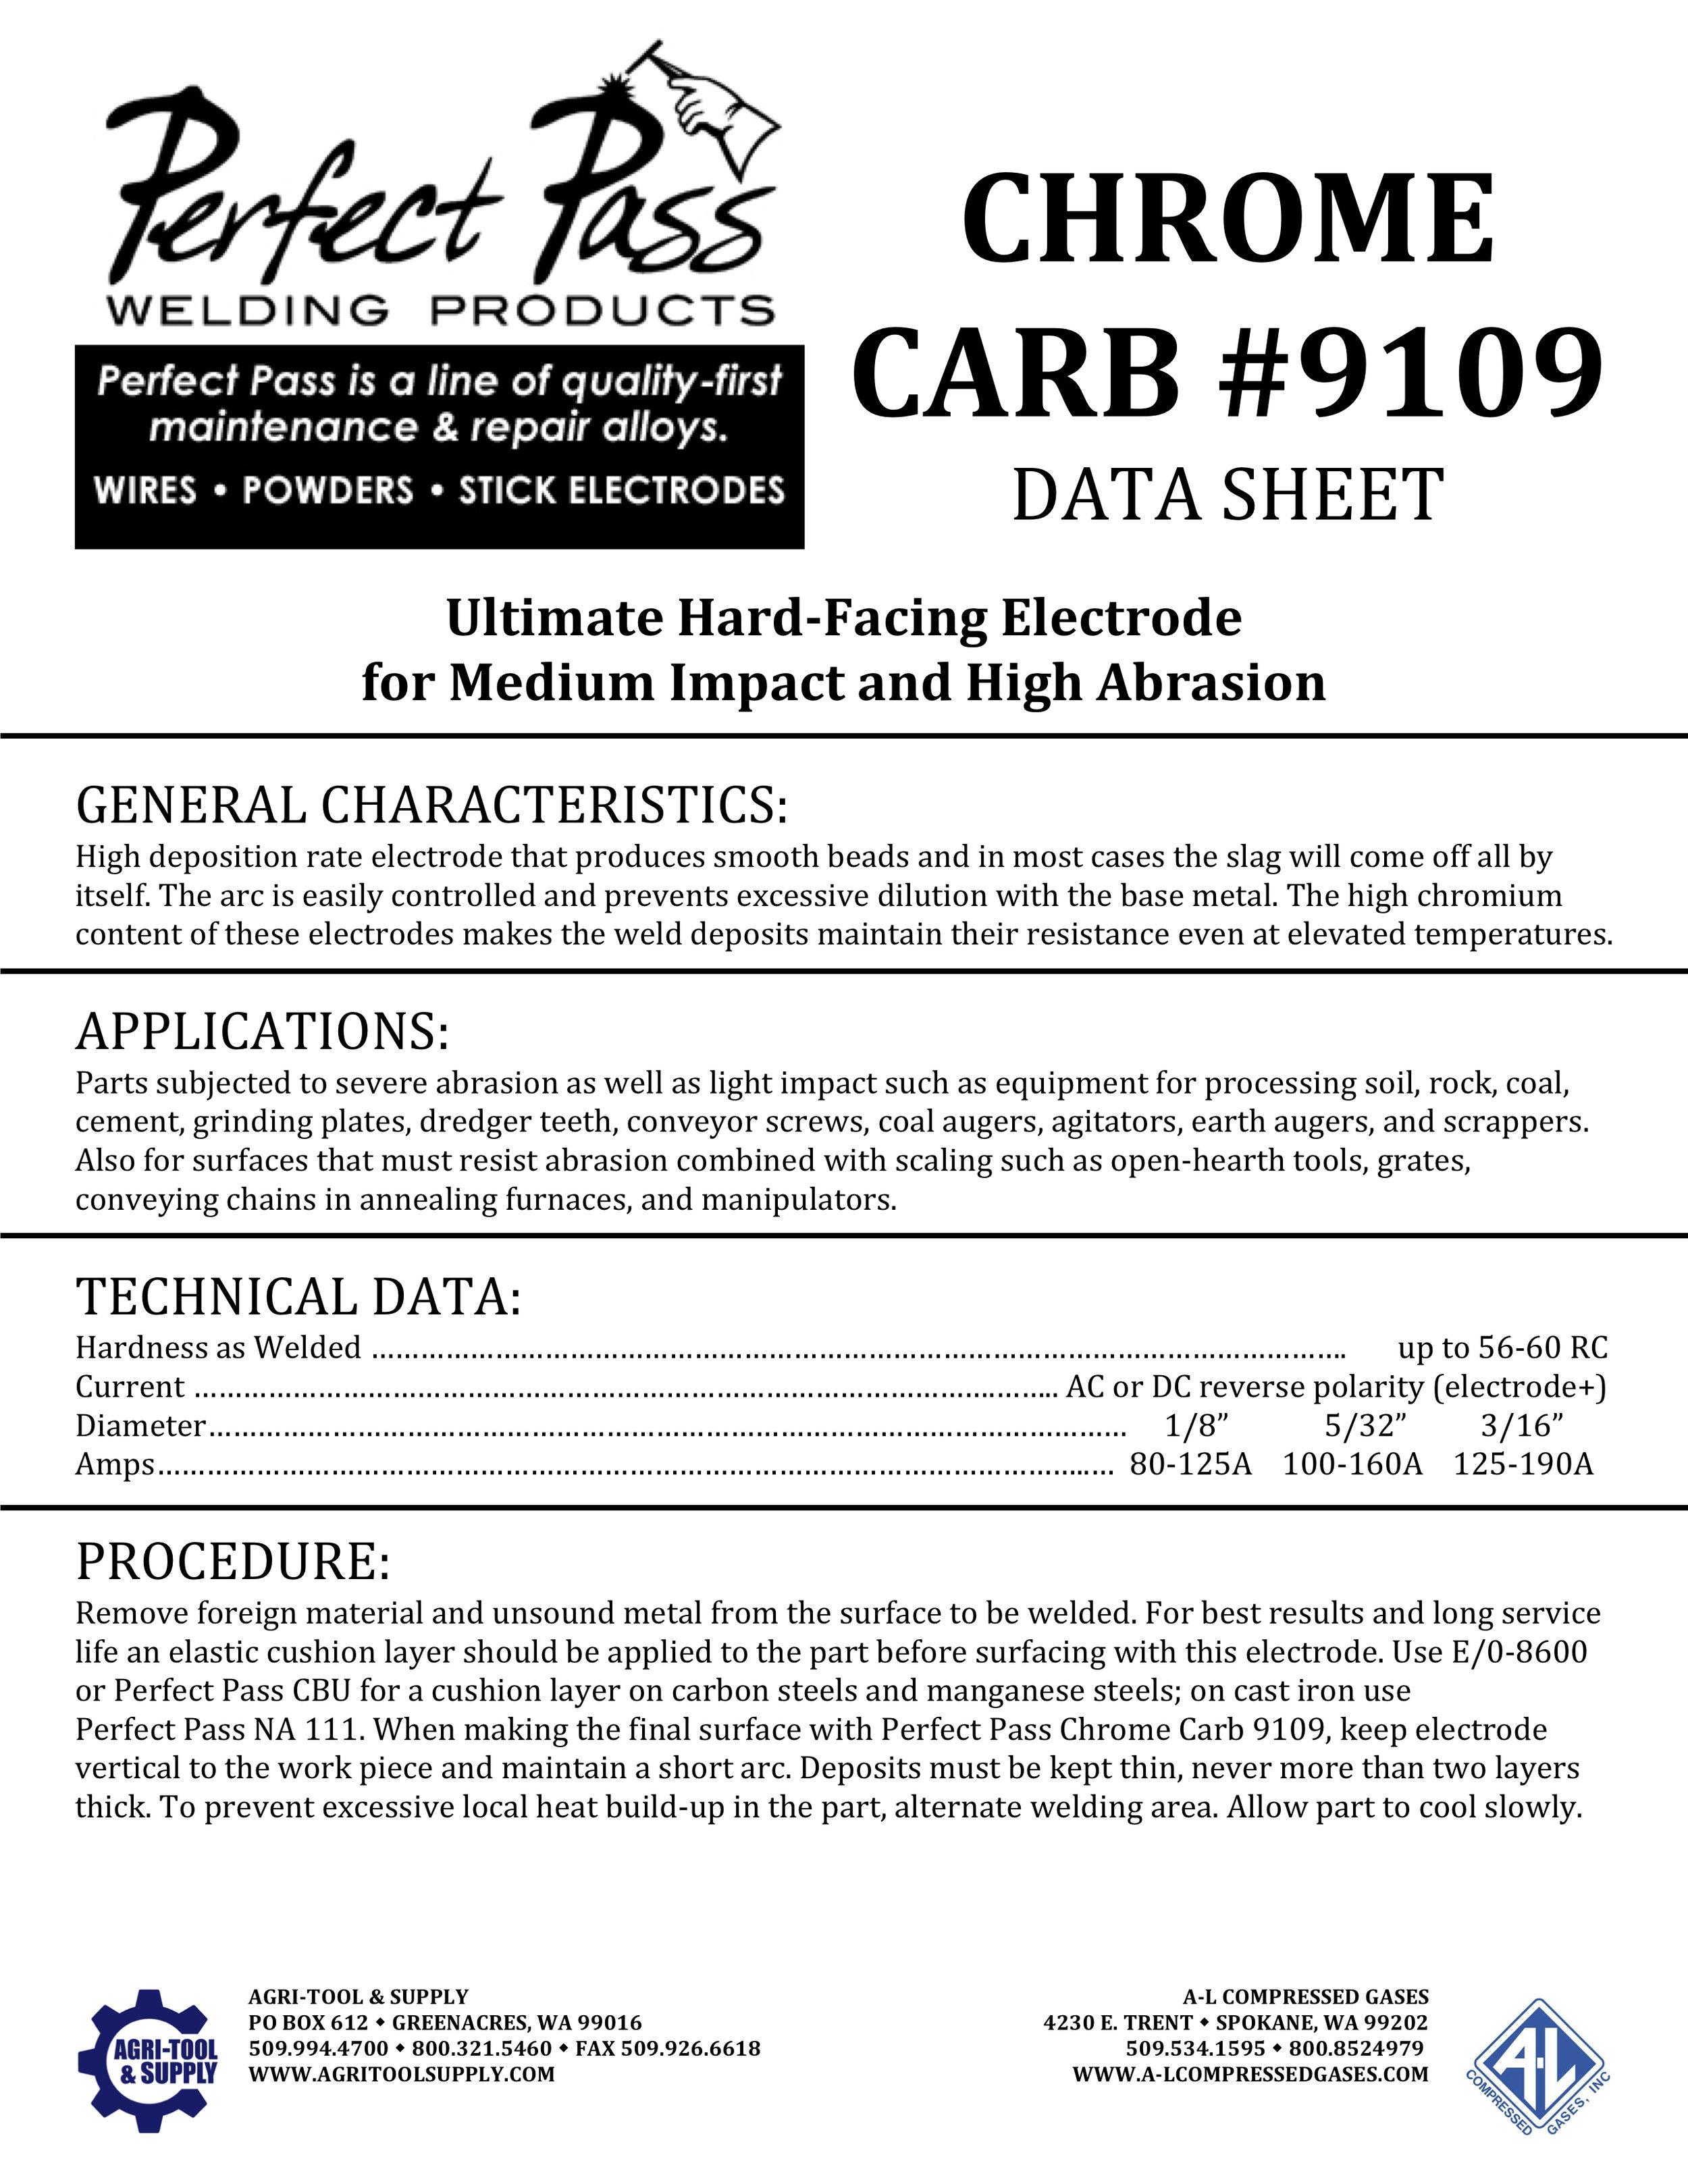 Chrome Carb #9109 JPEG.jpg